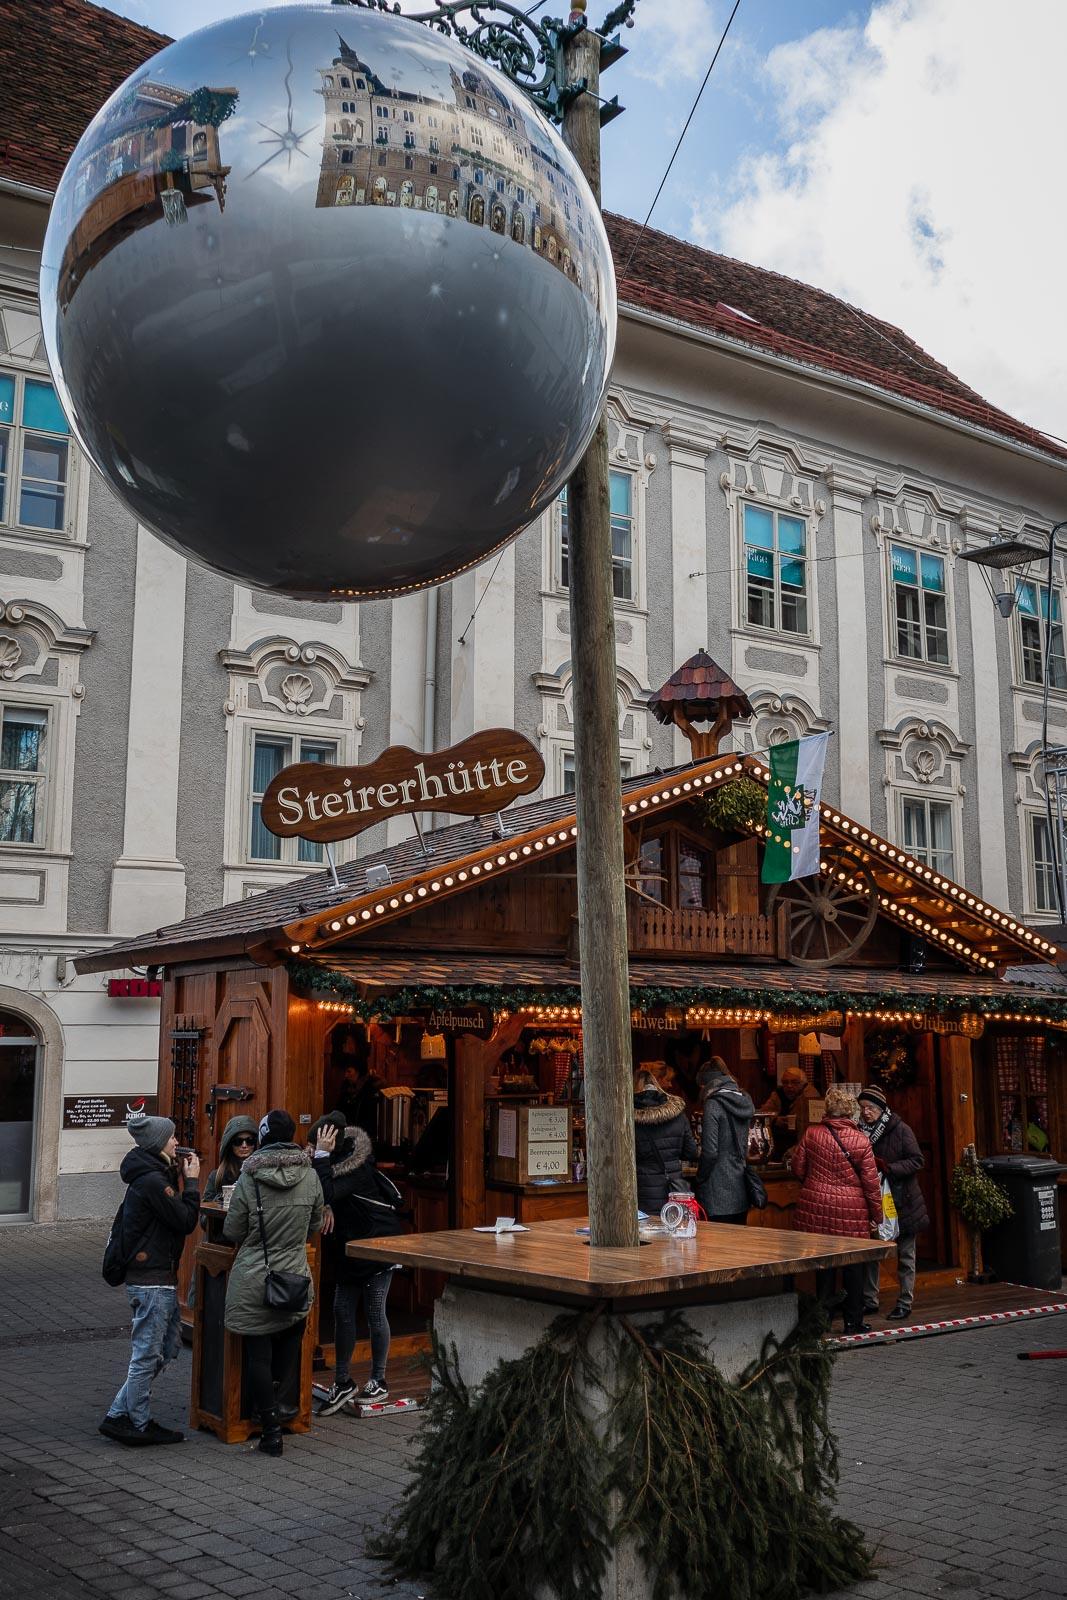 Christkindlmarkt Südtiroler Platz, Steirerhütte - Adventmärkte Graz, Weihnachtsmärkte, Christkindmarkt